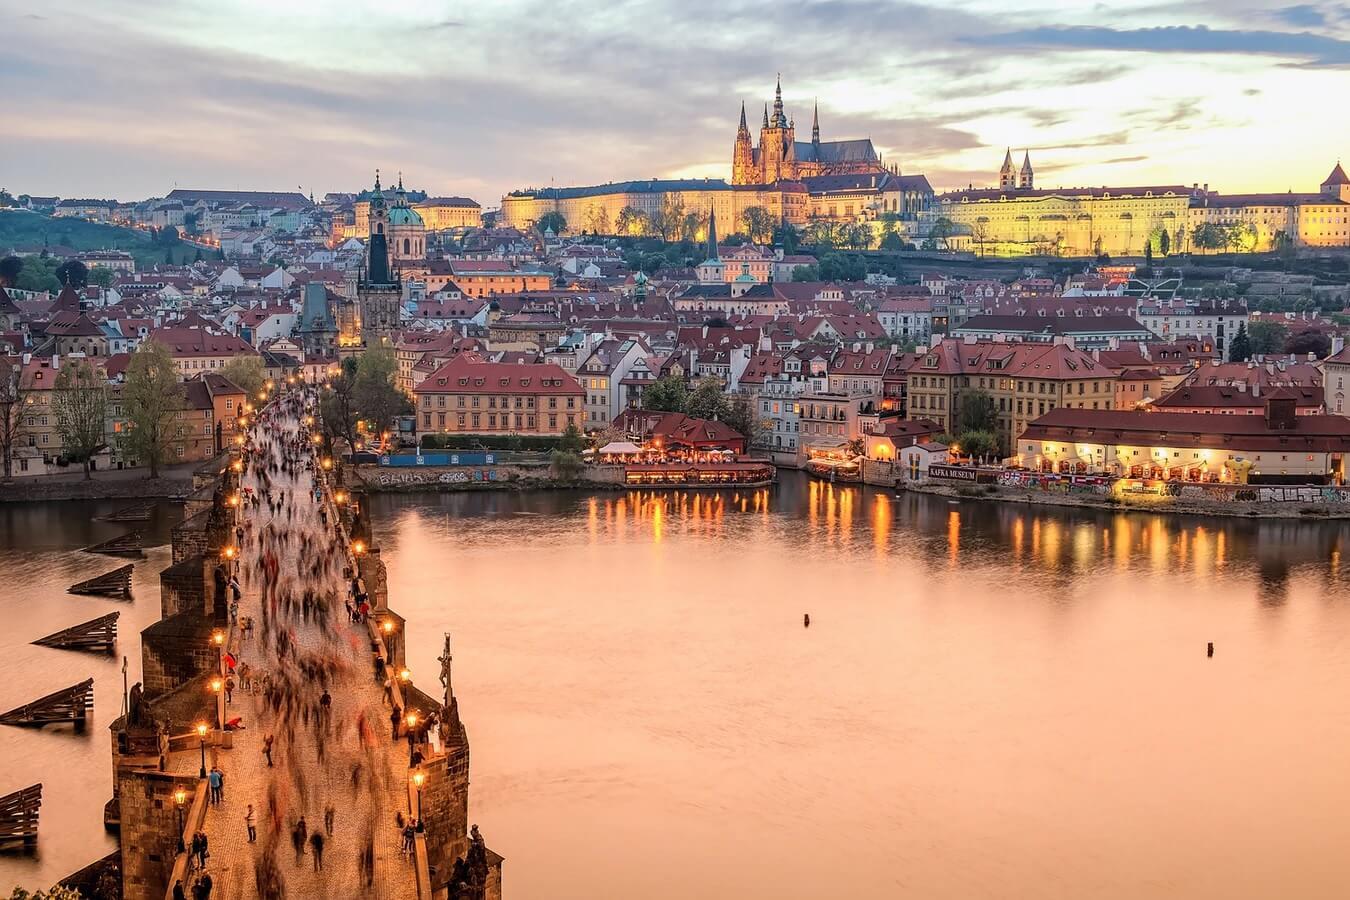 CfP: U.K. Czechoslovak Studies Network Conference: Reimagining 'The Heart of Europe' - deadline 8 August